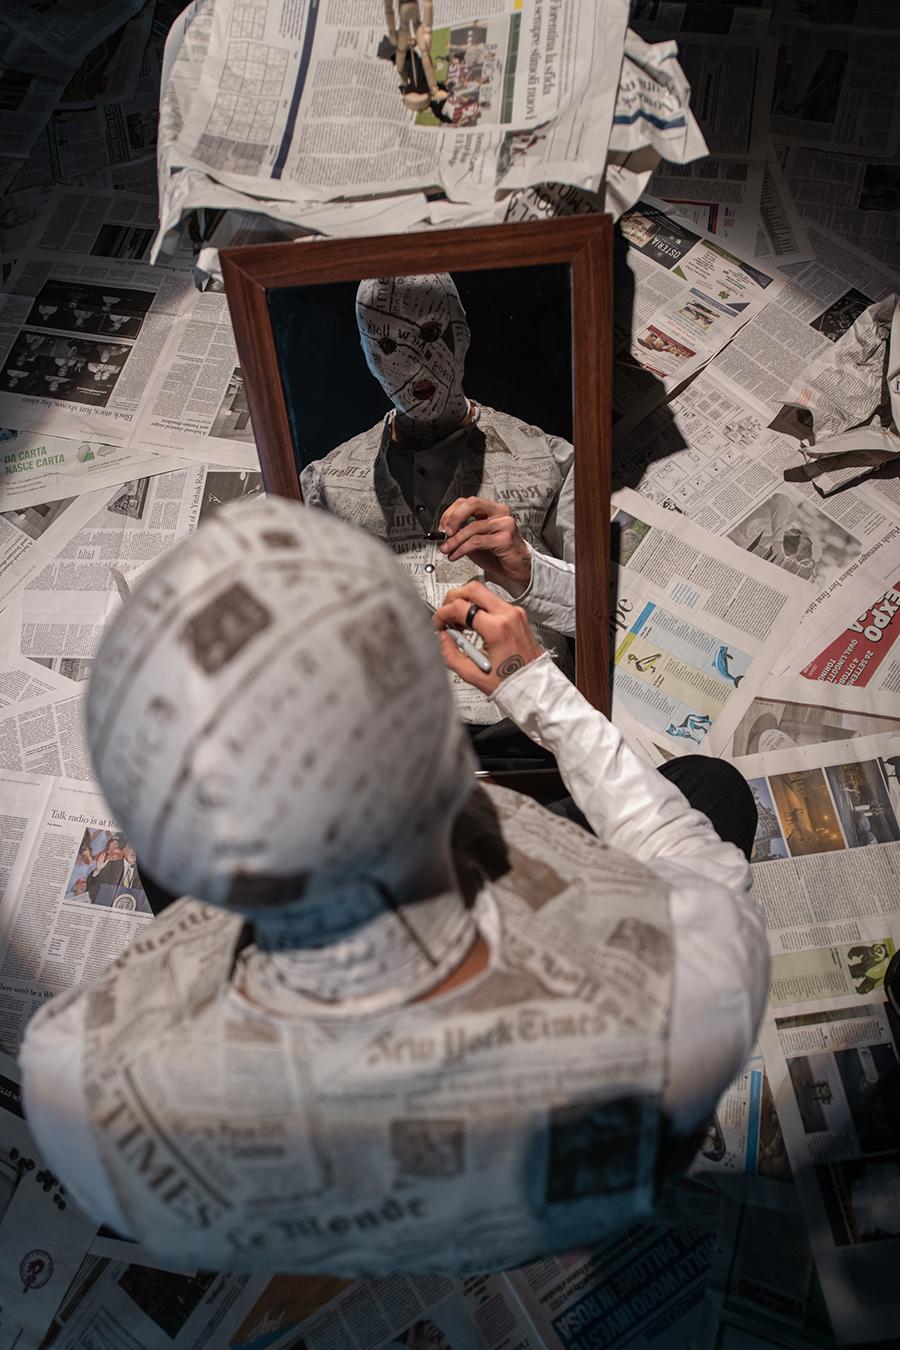 Periferie artistiche Roma. The Newspaper Man